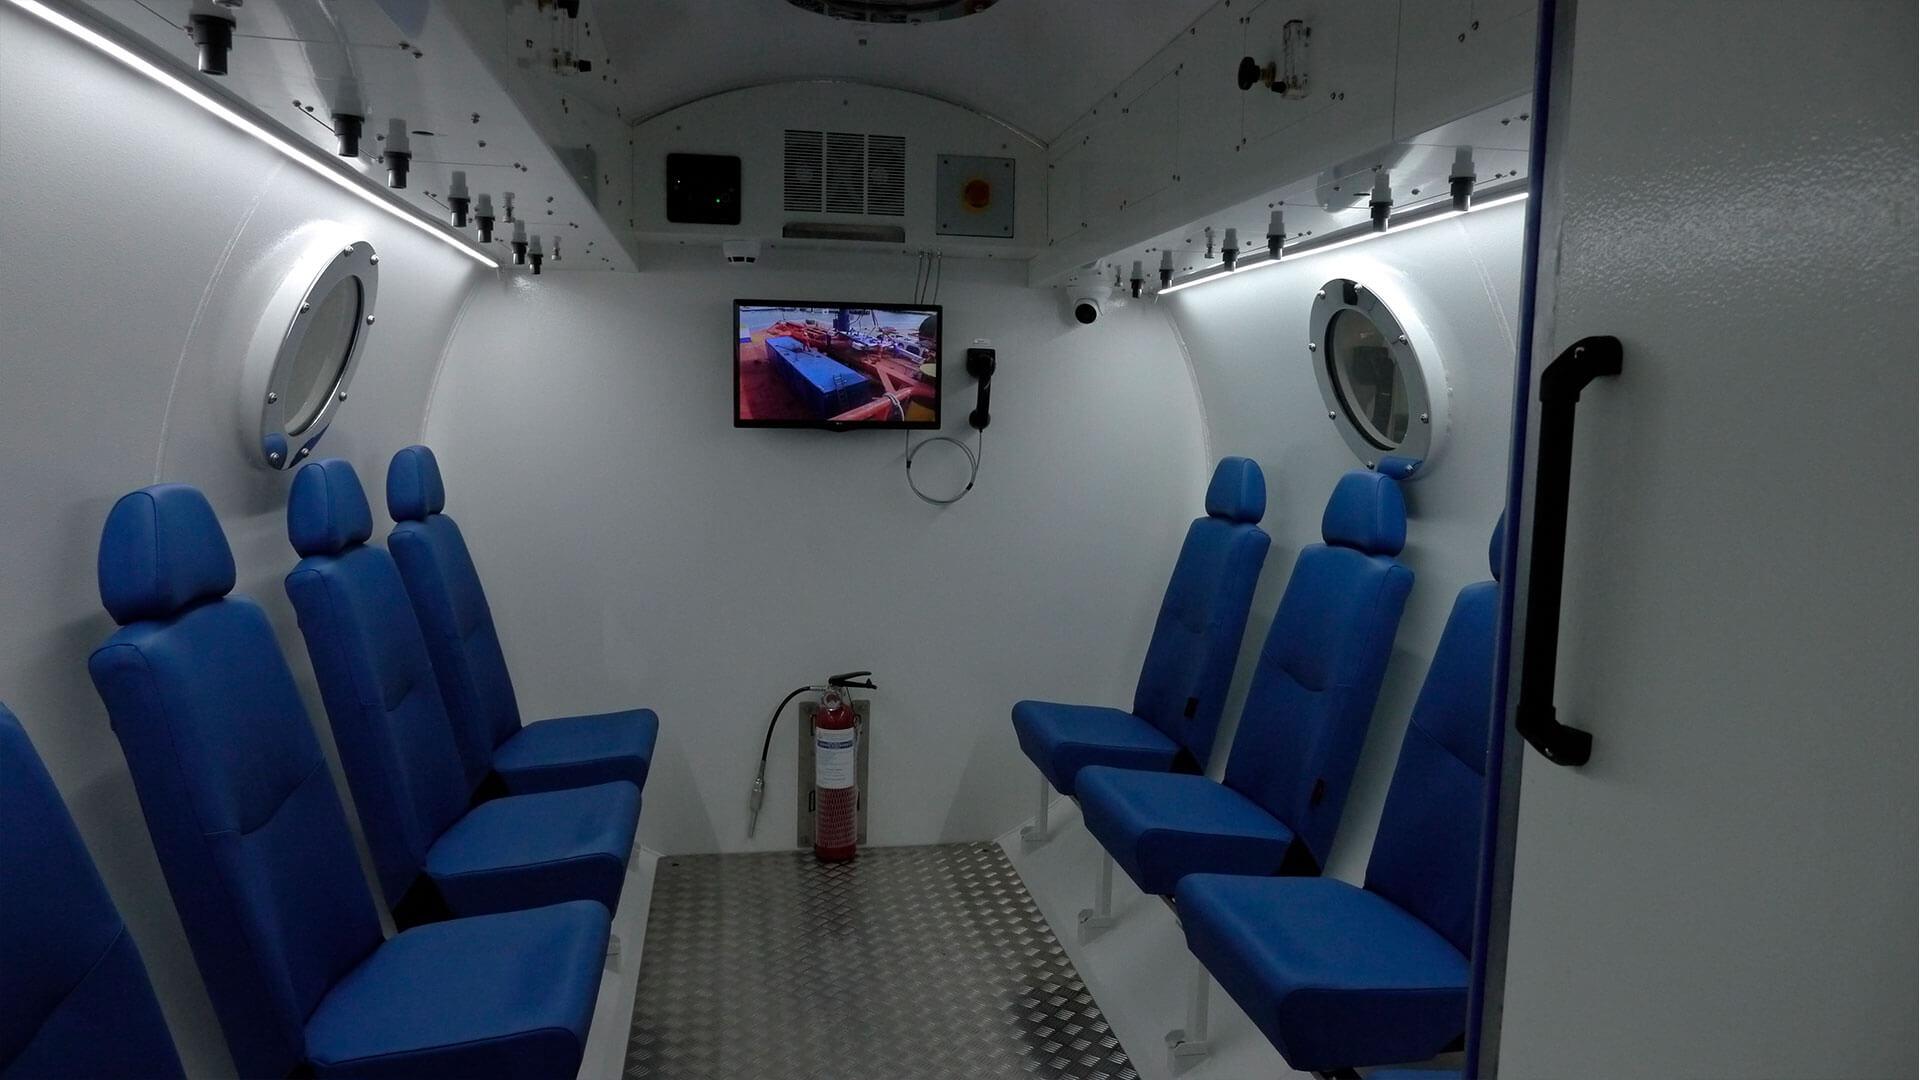 Full interior shot of hyperbaric chamber